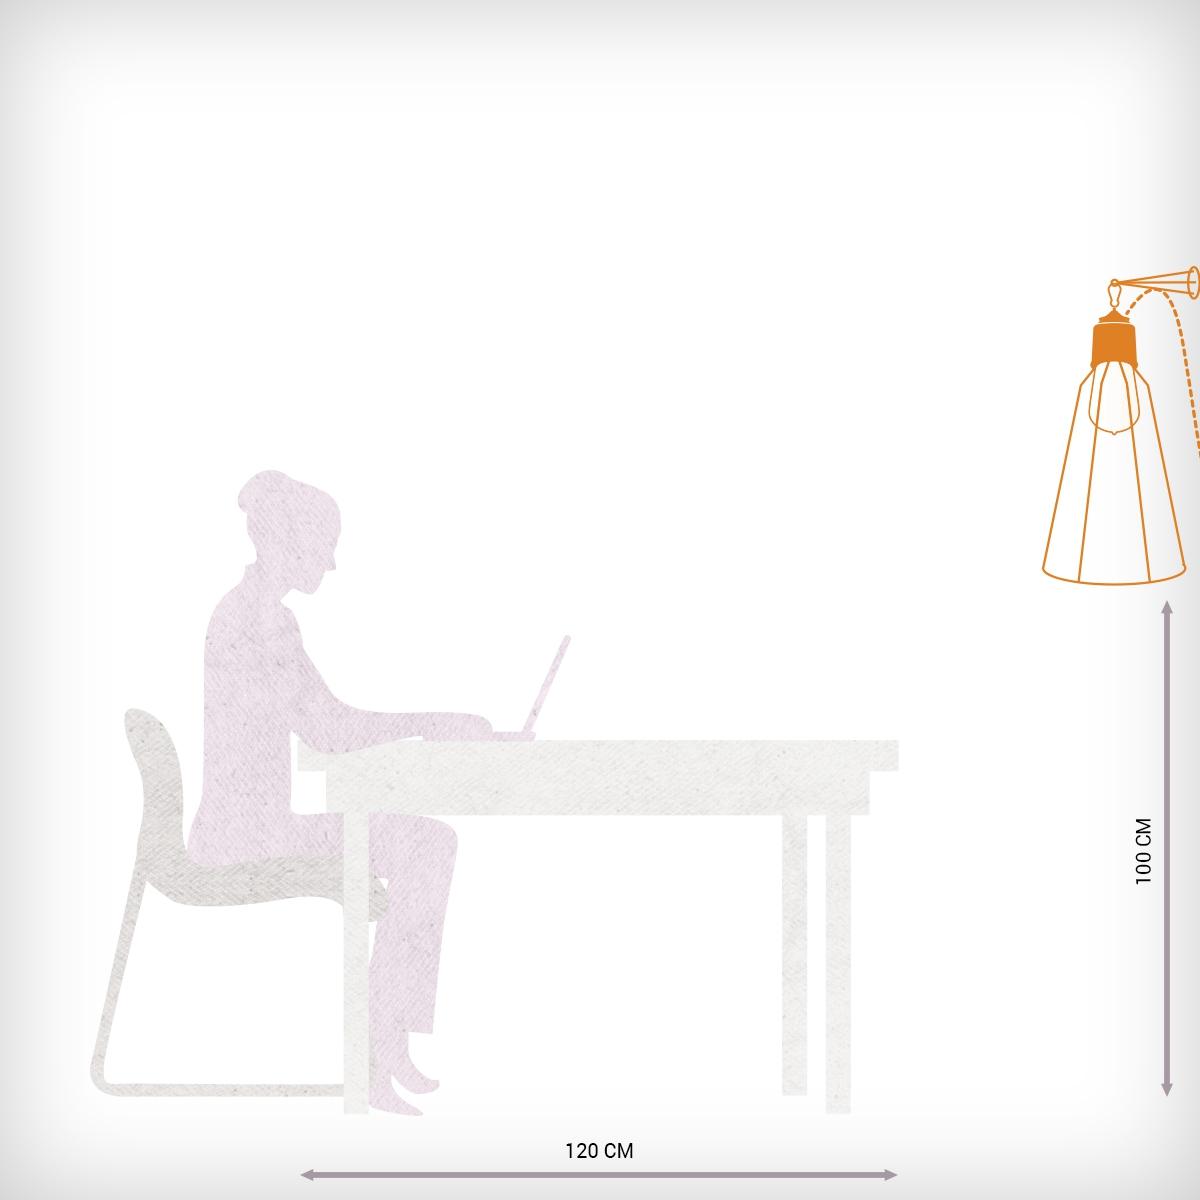 moderne wandleuchte im industriellen design. Black Bedroom Furniture Sets. Home Design Ideas